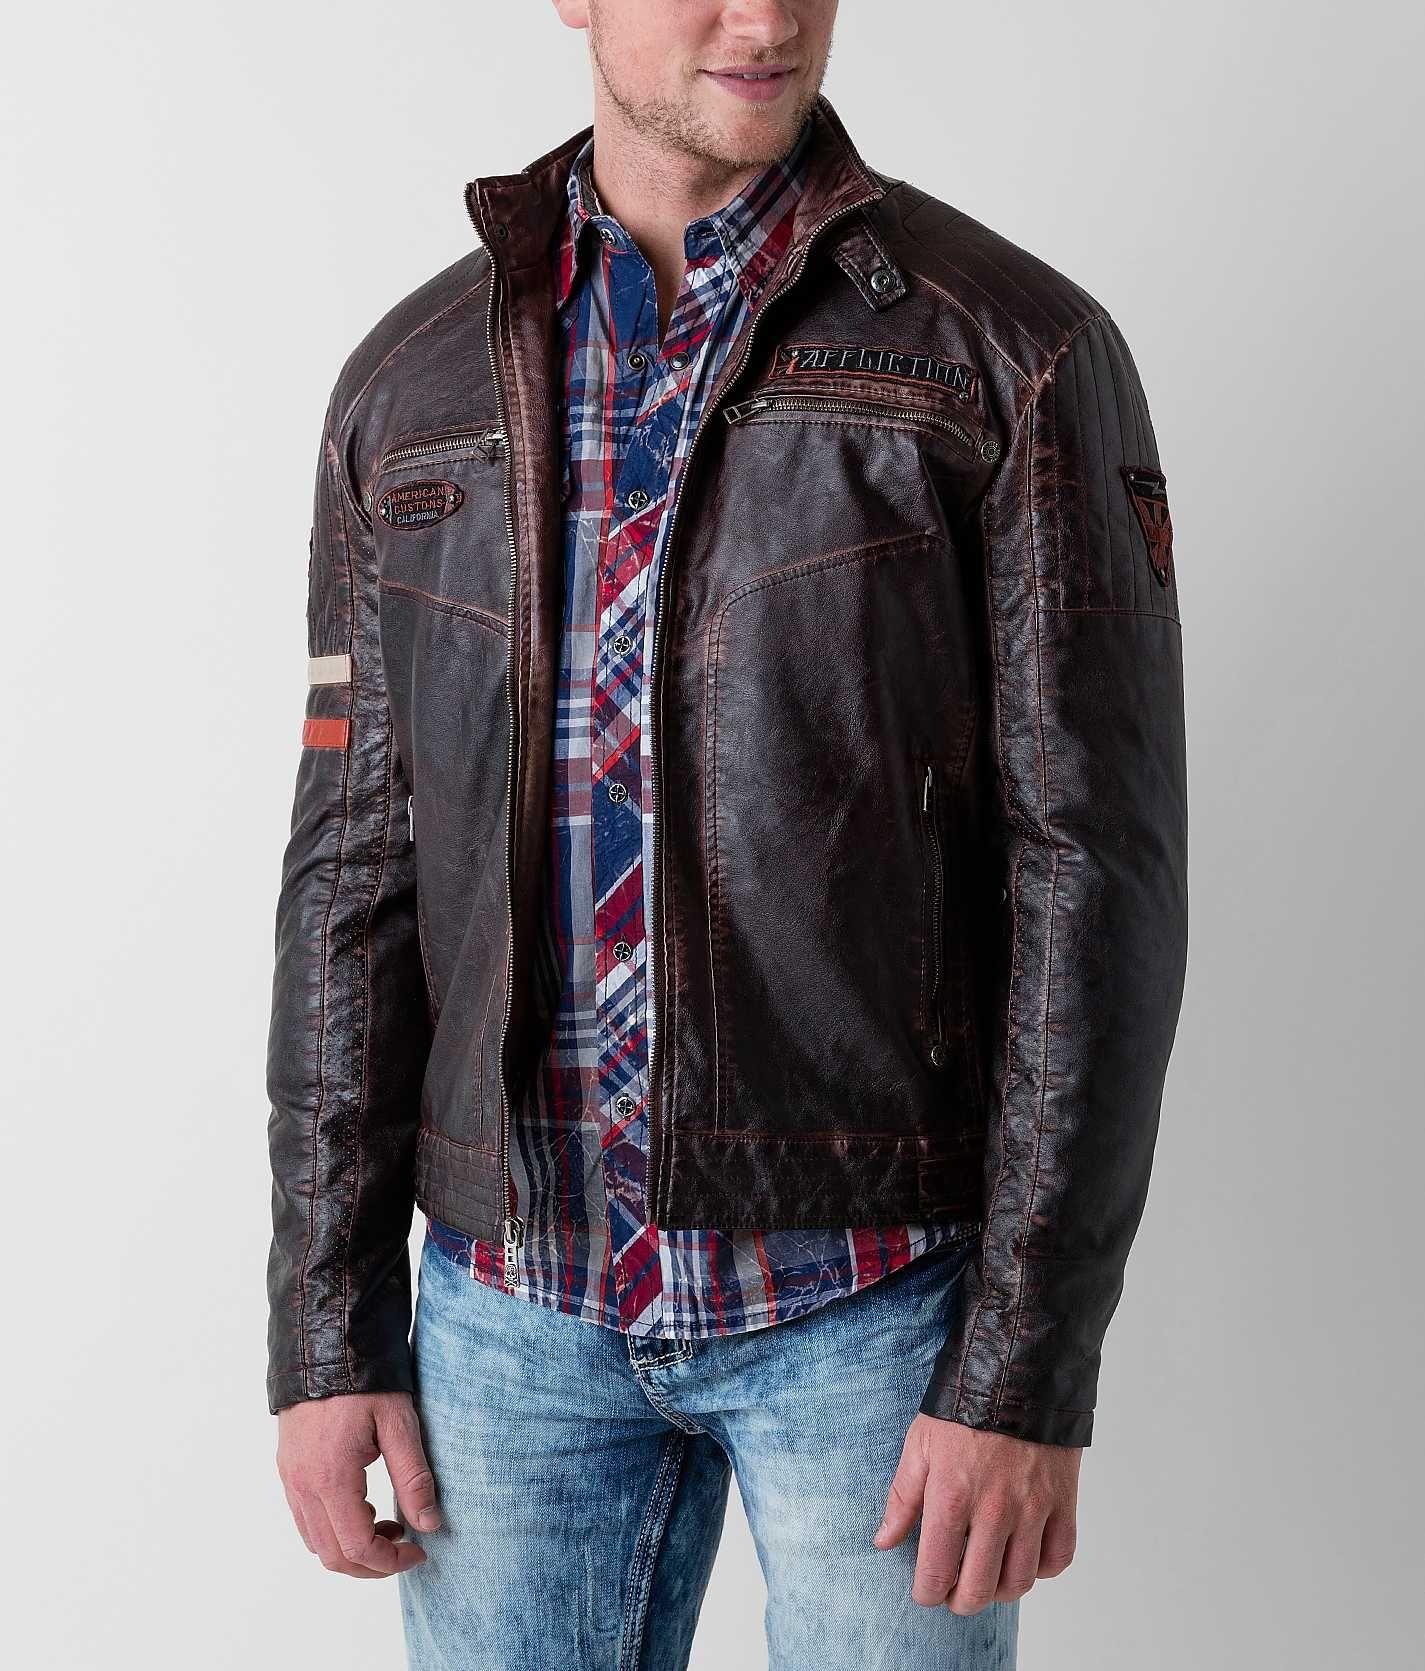 Affliction Black Premium Recklessness Jacket Trendy mens